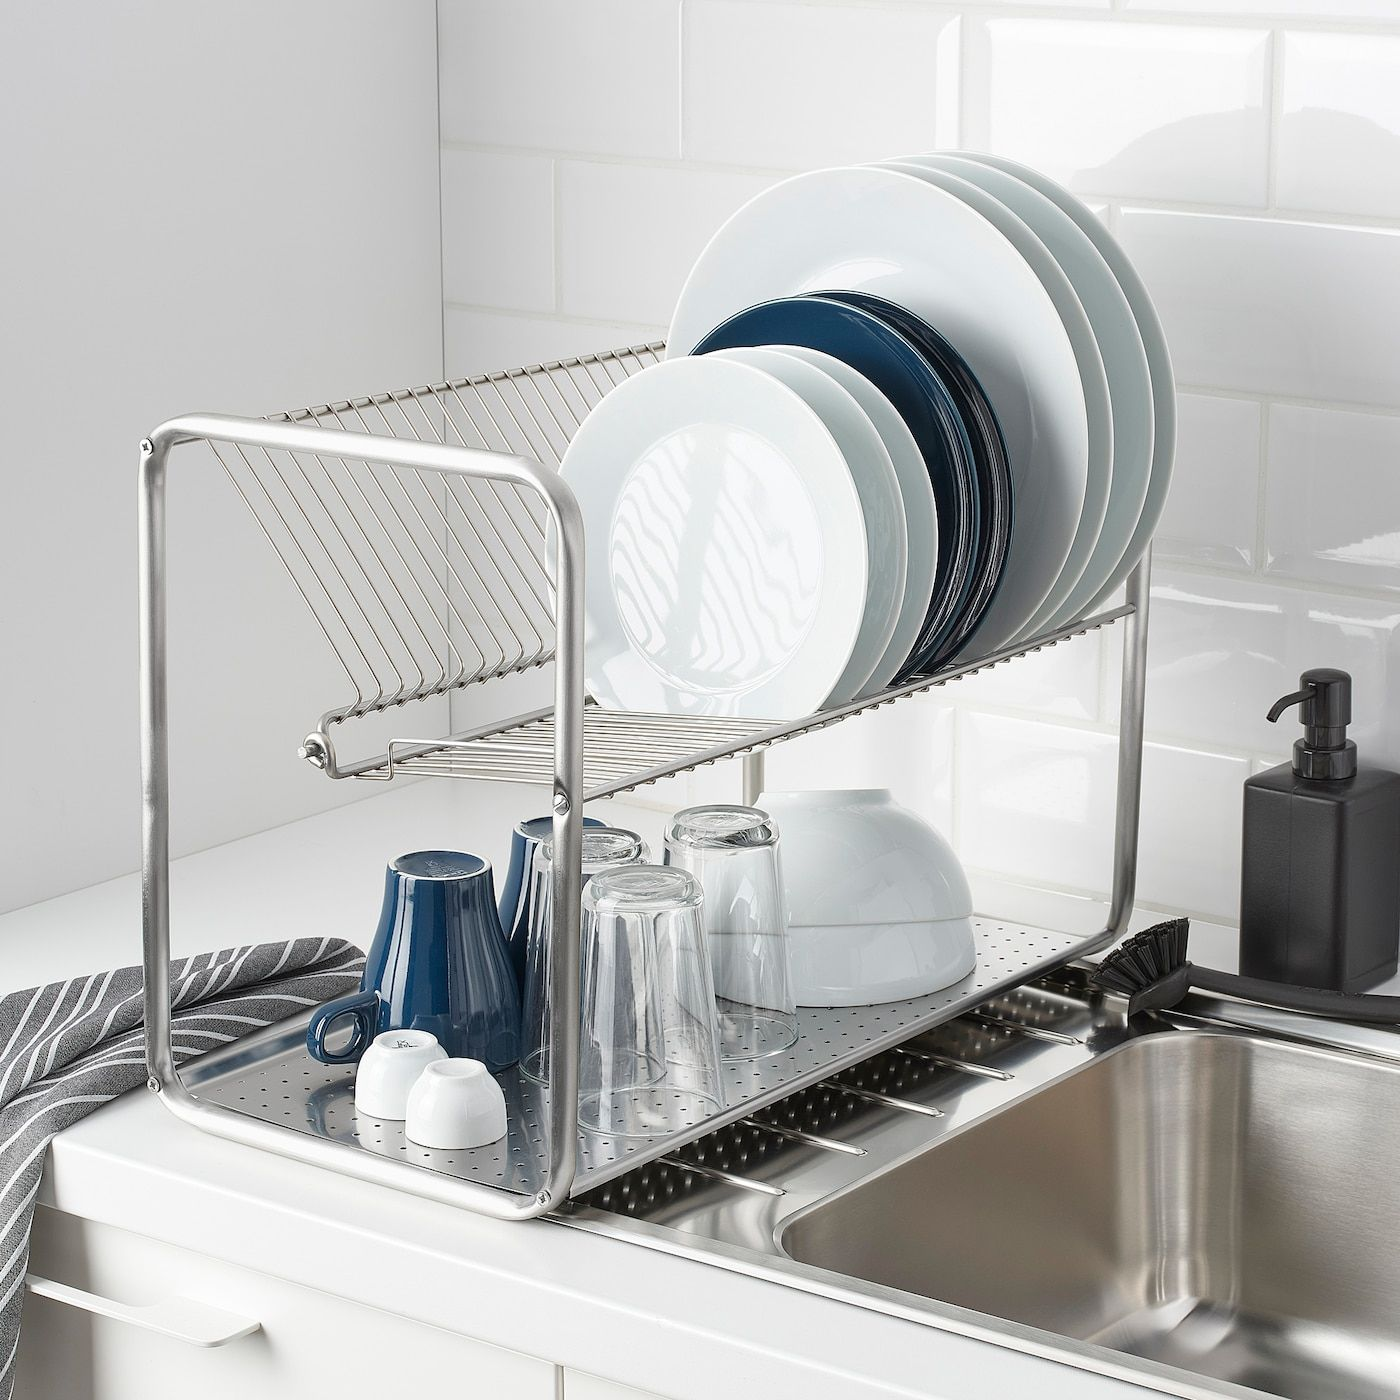 Ikea Ordning Dish Drainer In 2020 Ikea Dish Drainers